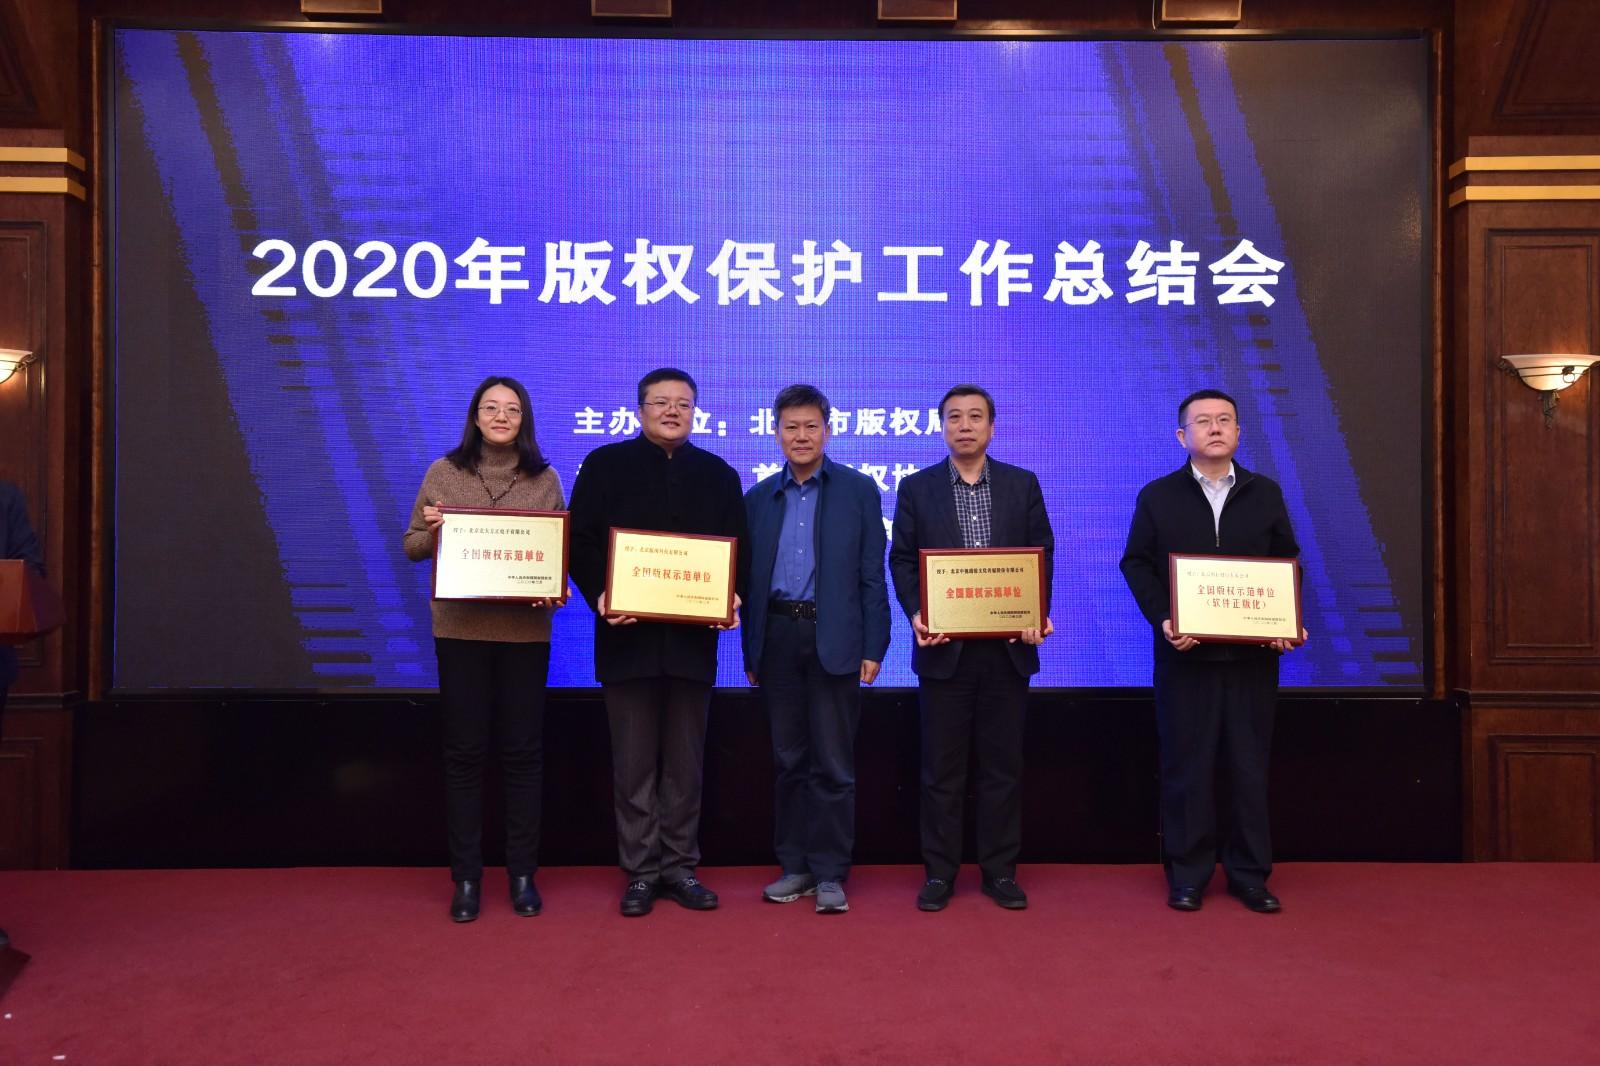 https://ft-bk1.oss-cn-zhangjiakou.aliyuncs.com/Public/Uploads/img/n_content_20201210150013_8721.jpg